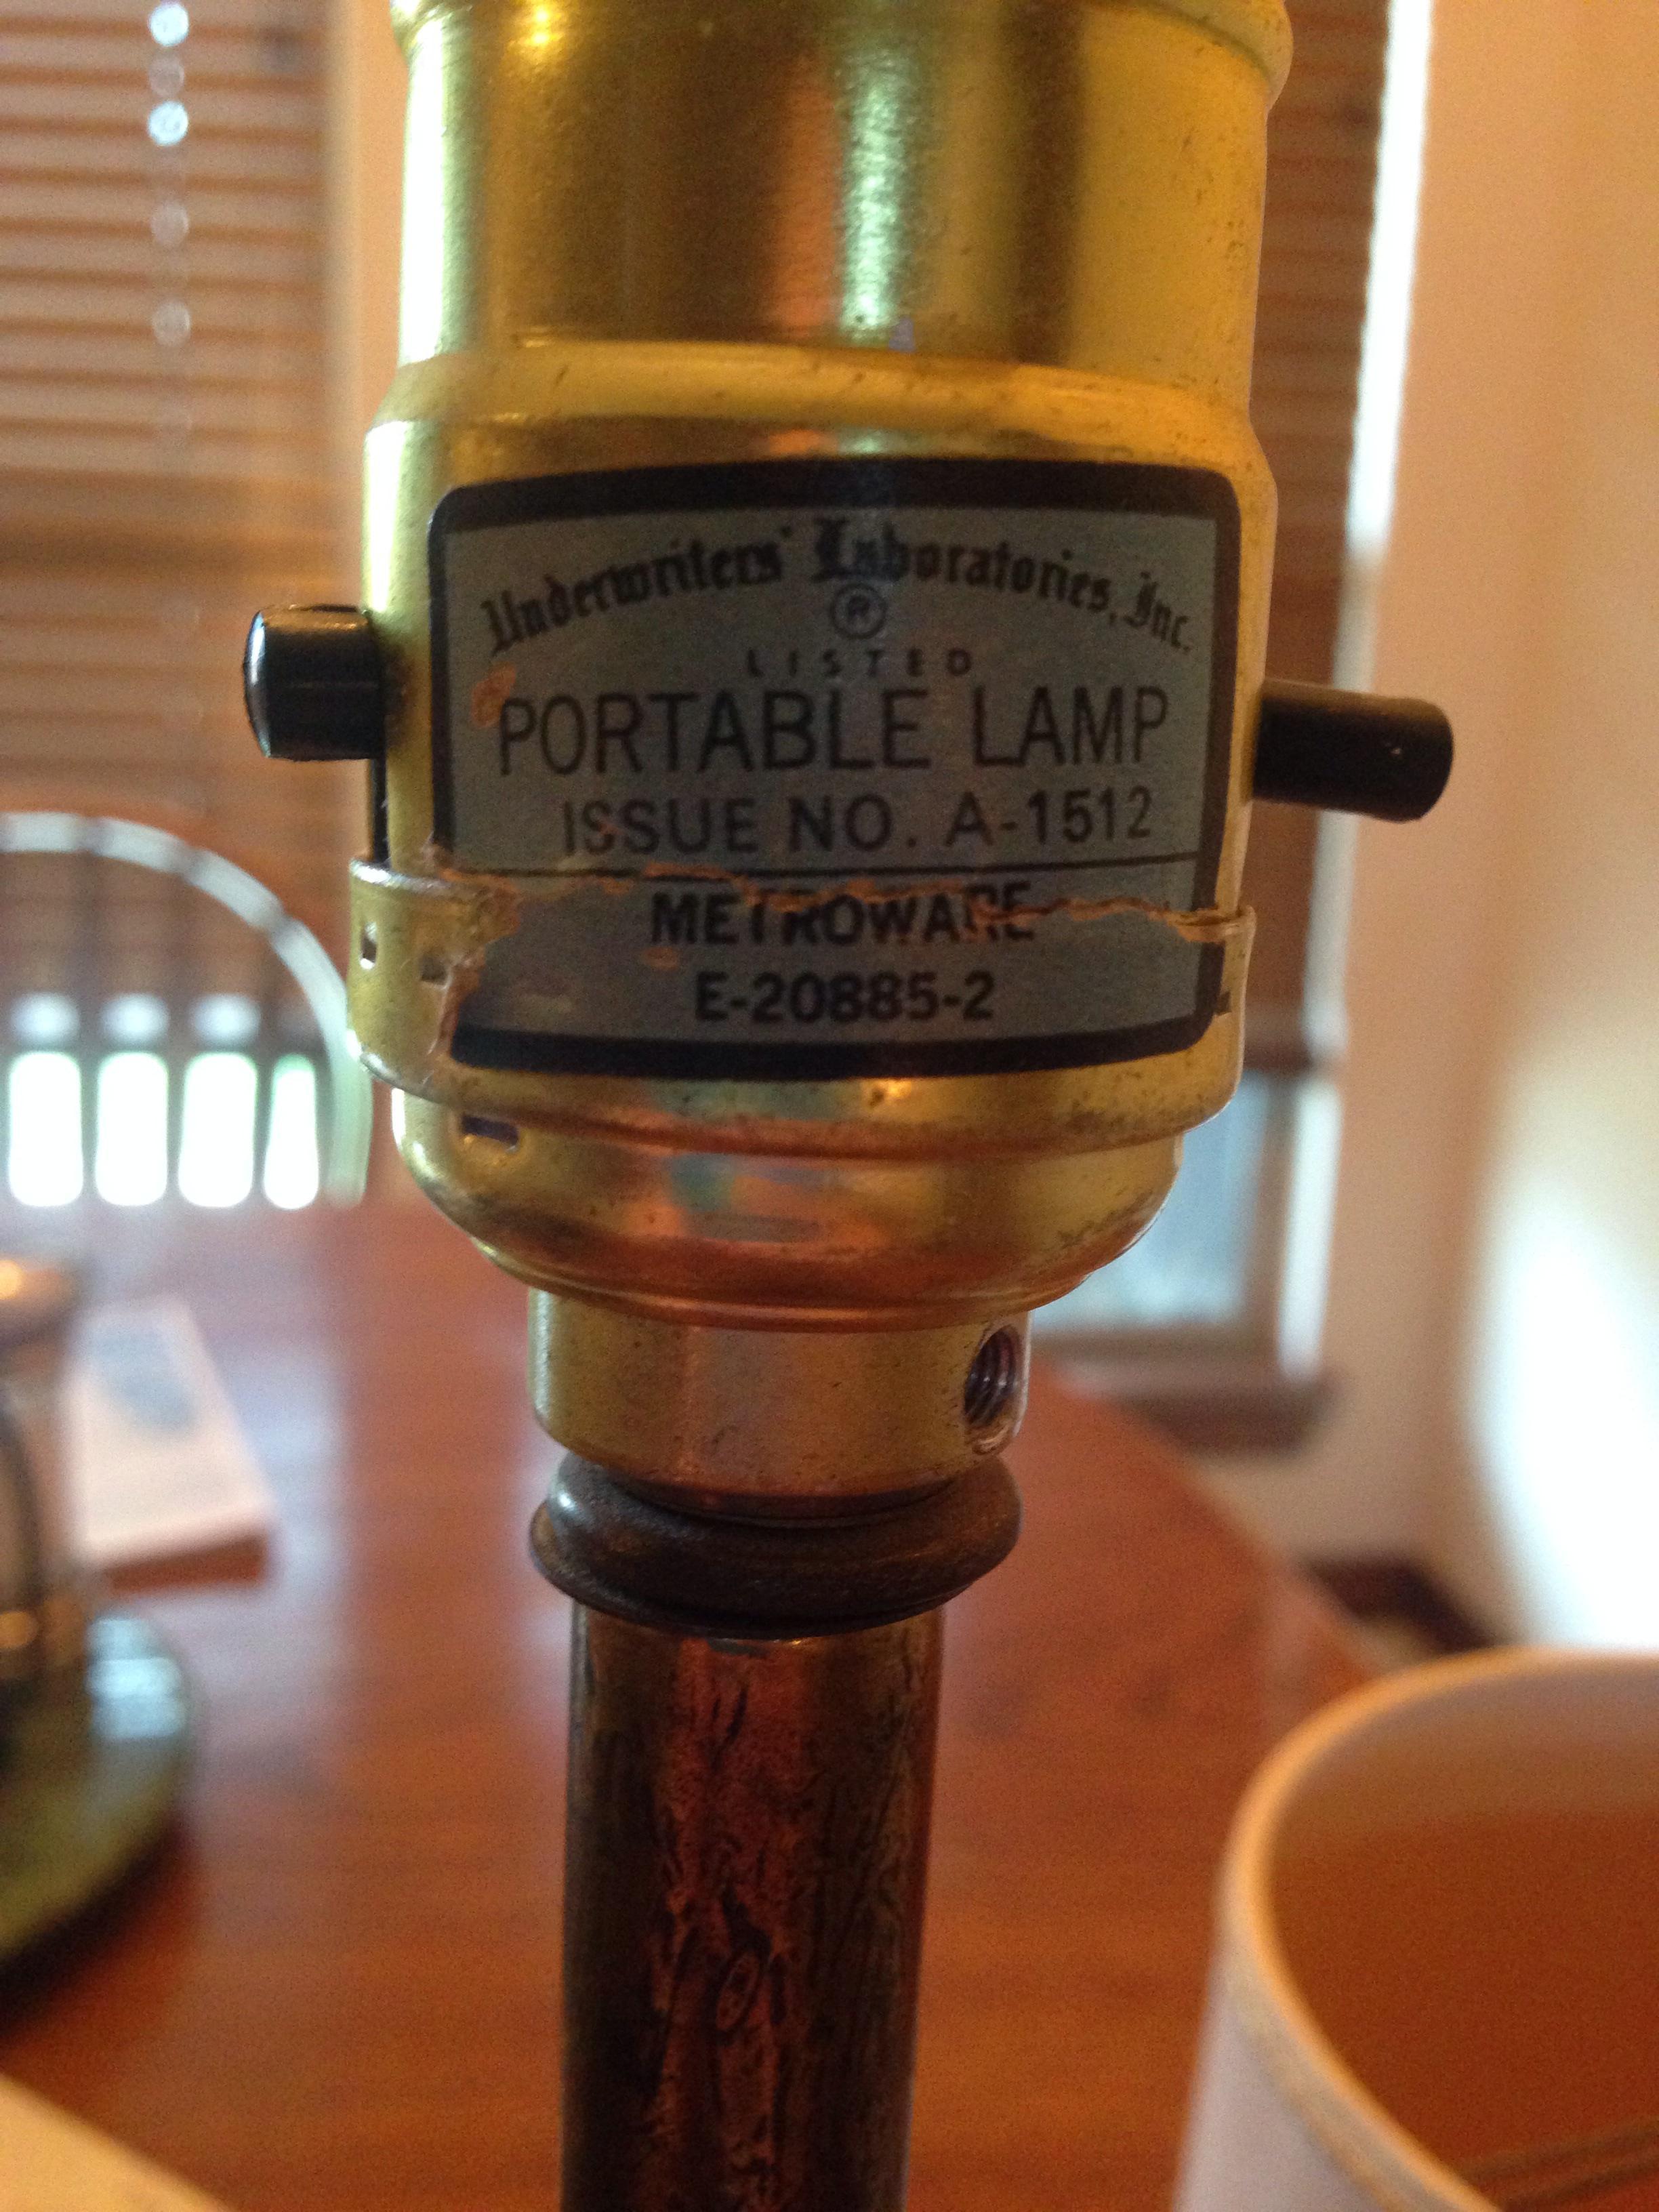 Underwriters portable lamp antique appraisal | InstAppraisal